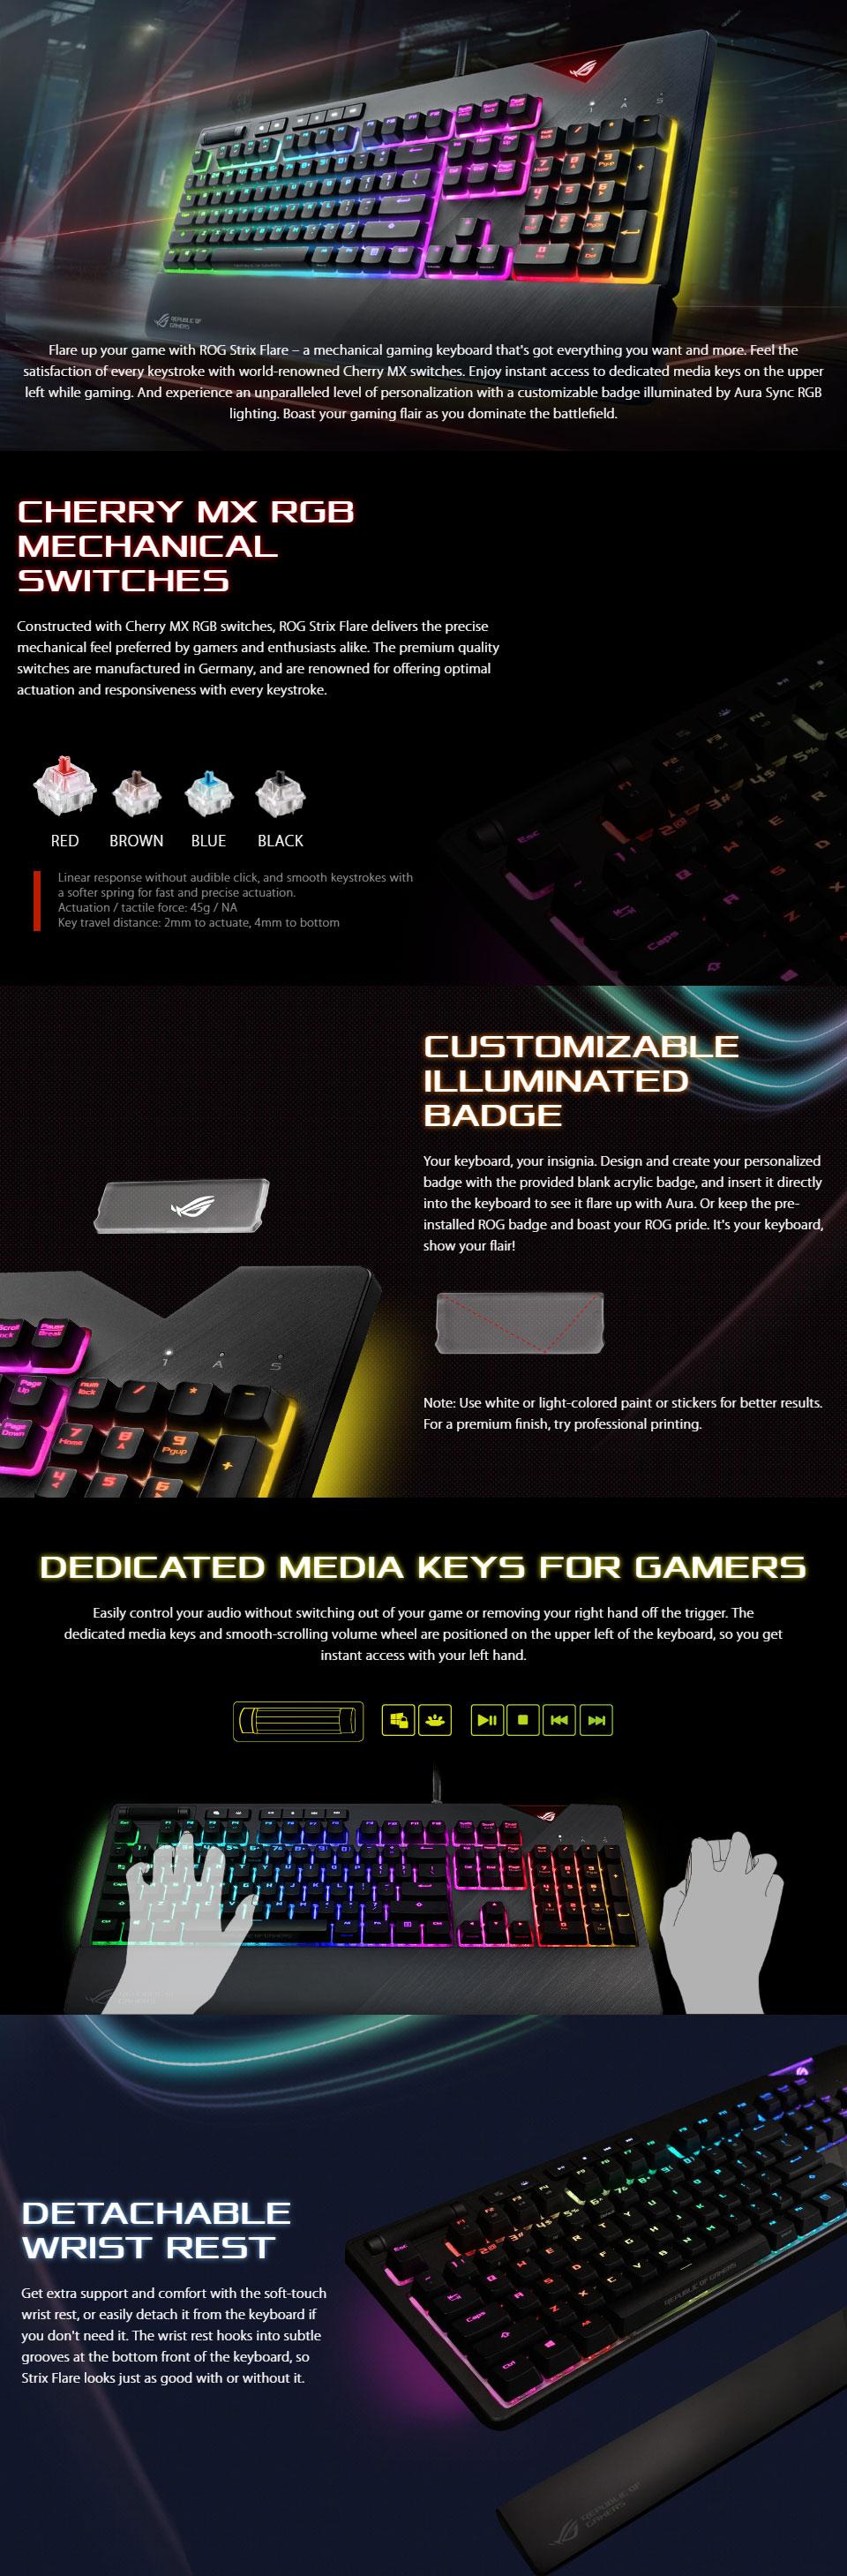 Asus ROG Strix Flare RGB Mechanical Gaming Keyboard with Cherry MX RGB  Switches, Customized Illumina